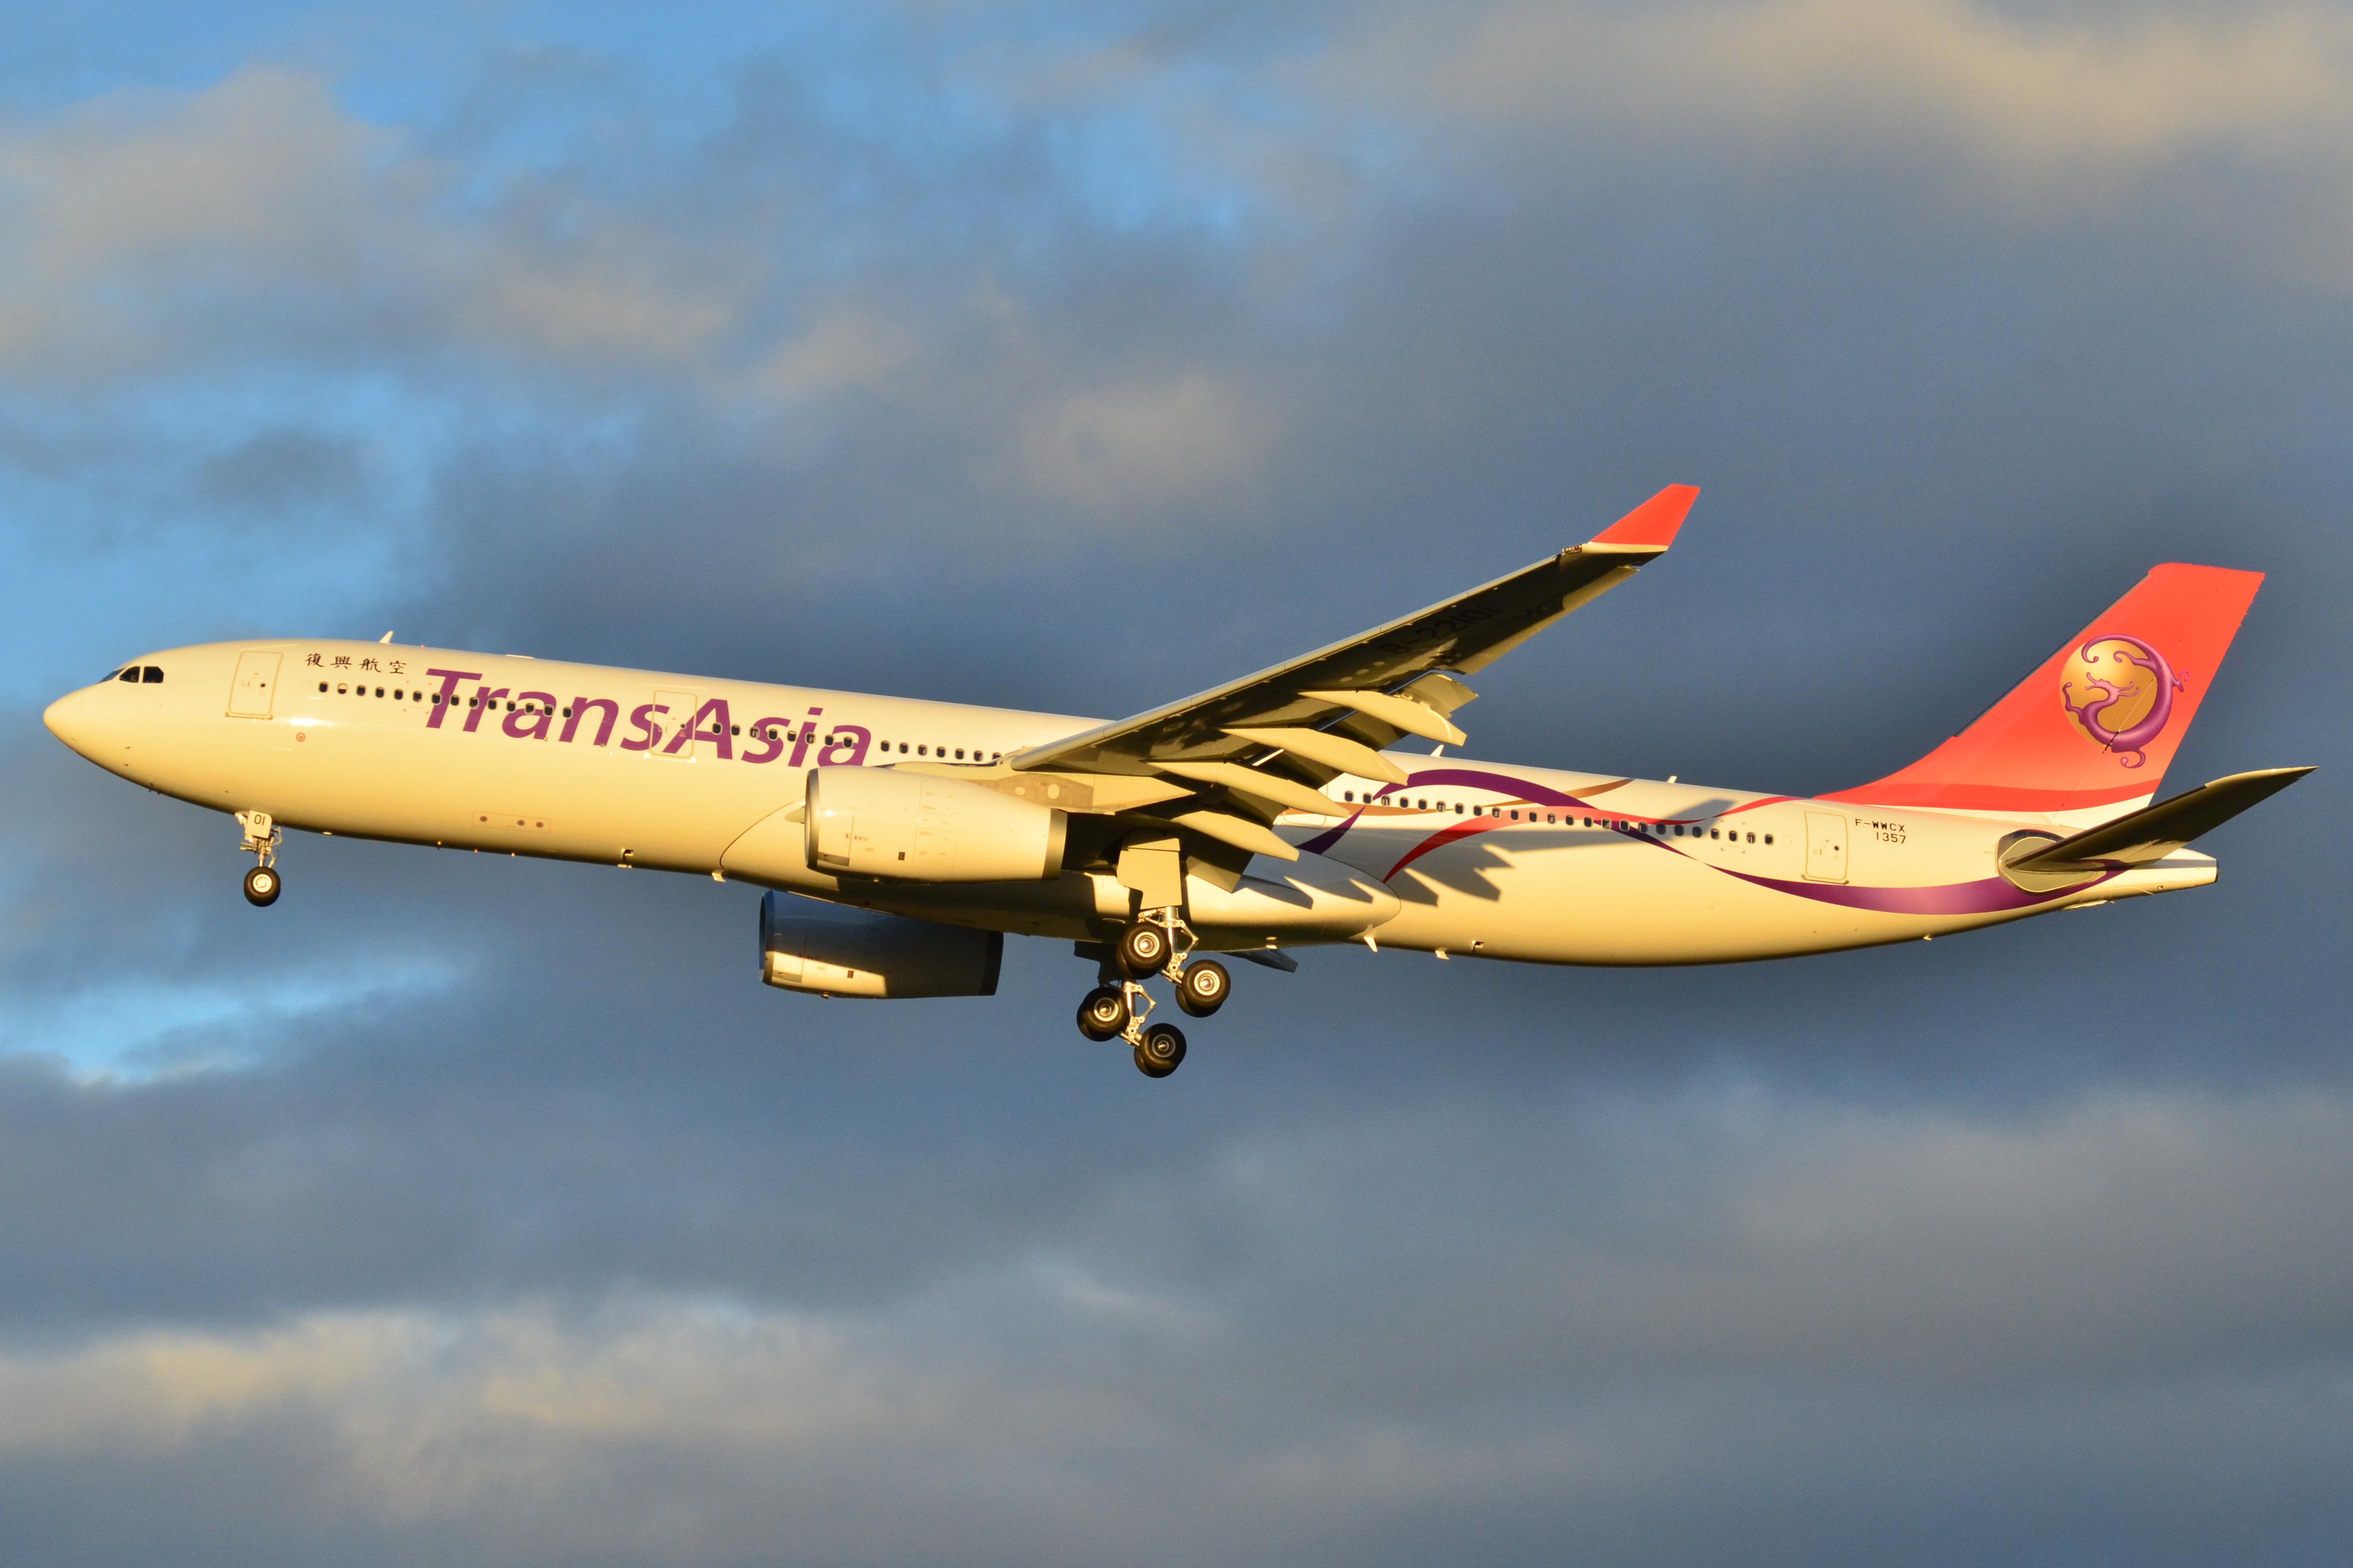 File:TransAsia Airbus A330 - F-WWCX - MSN 1357 (10332182913).